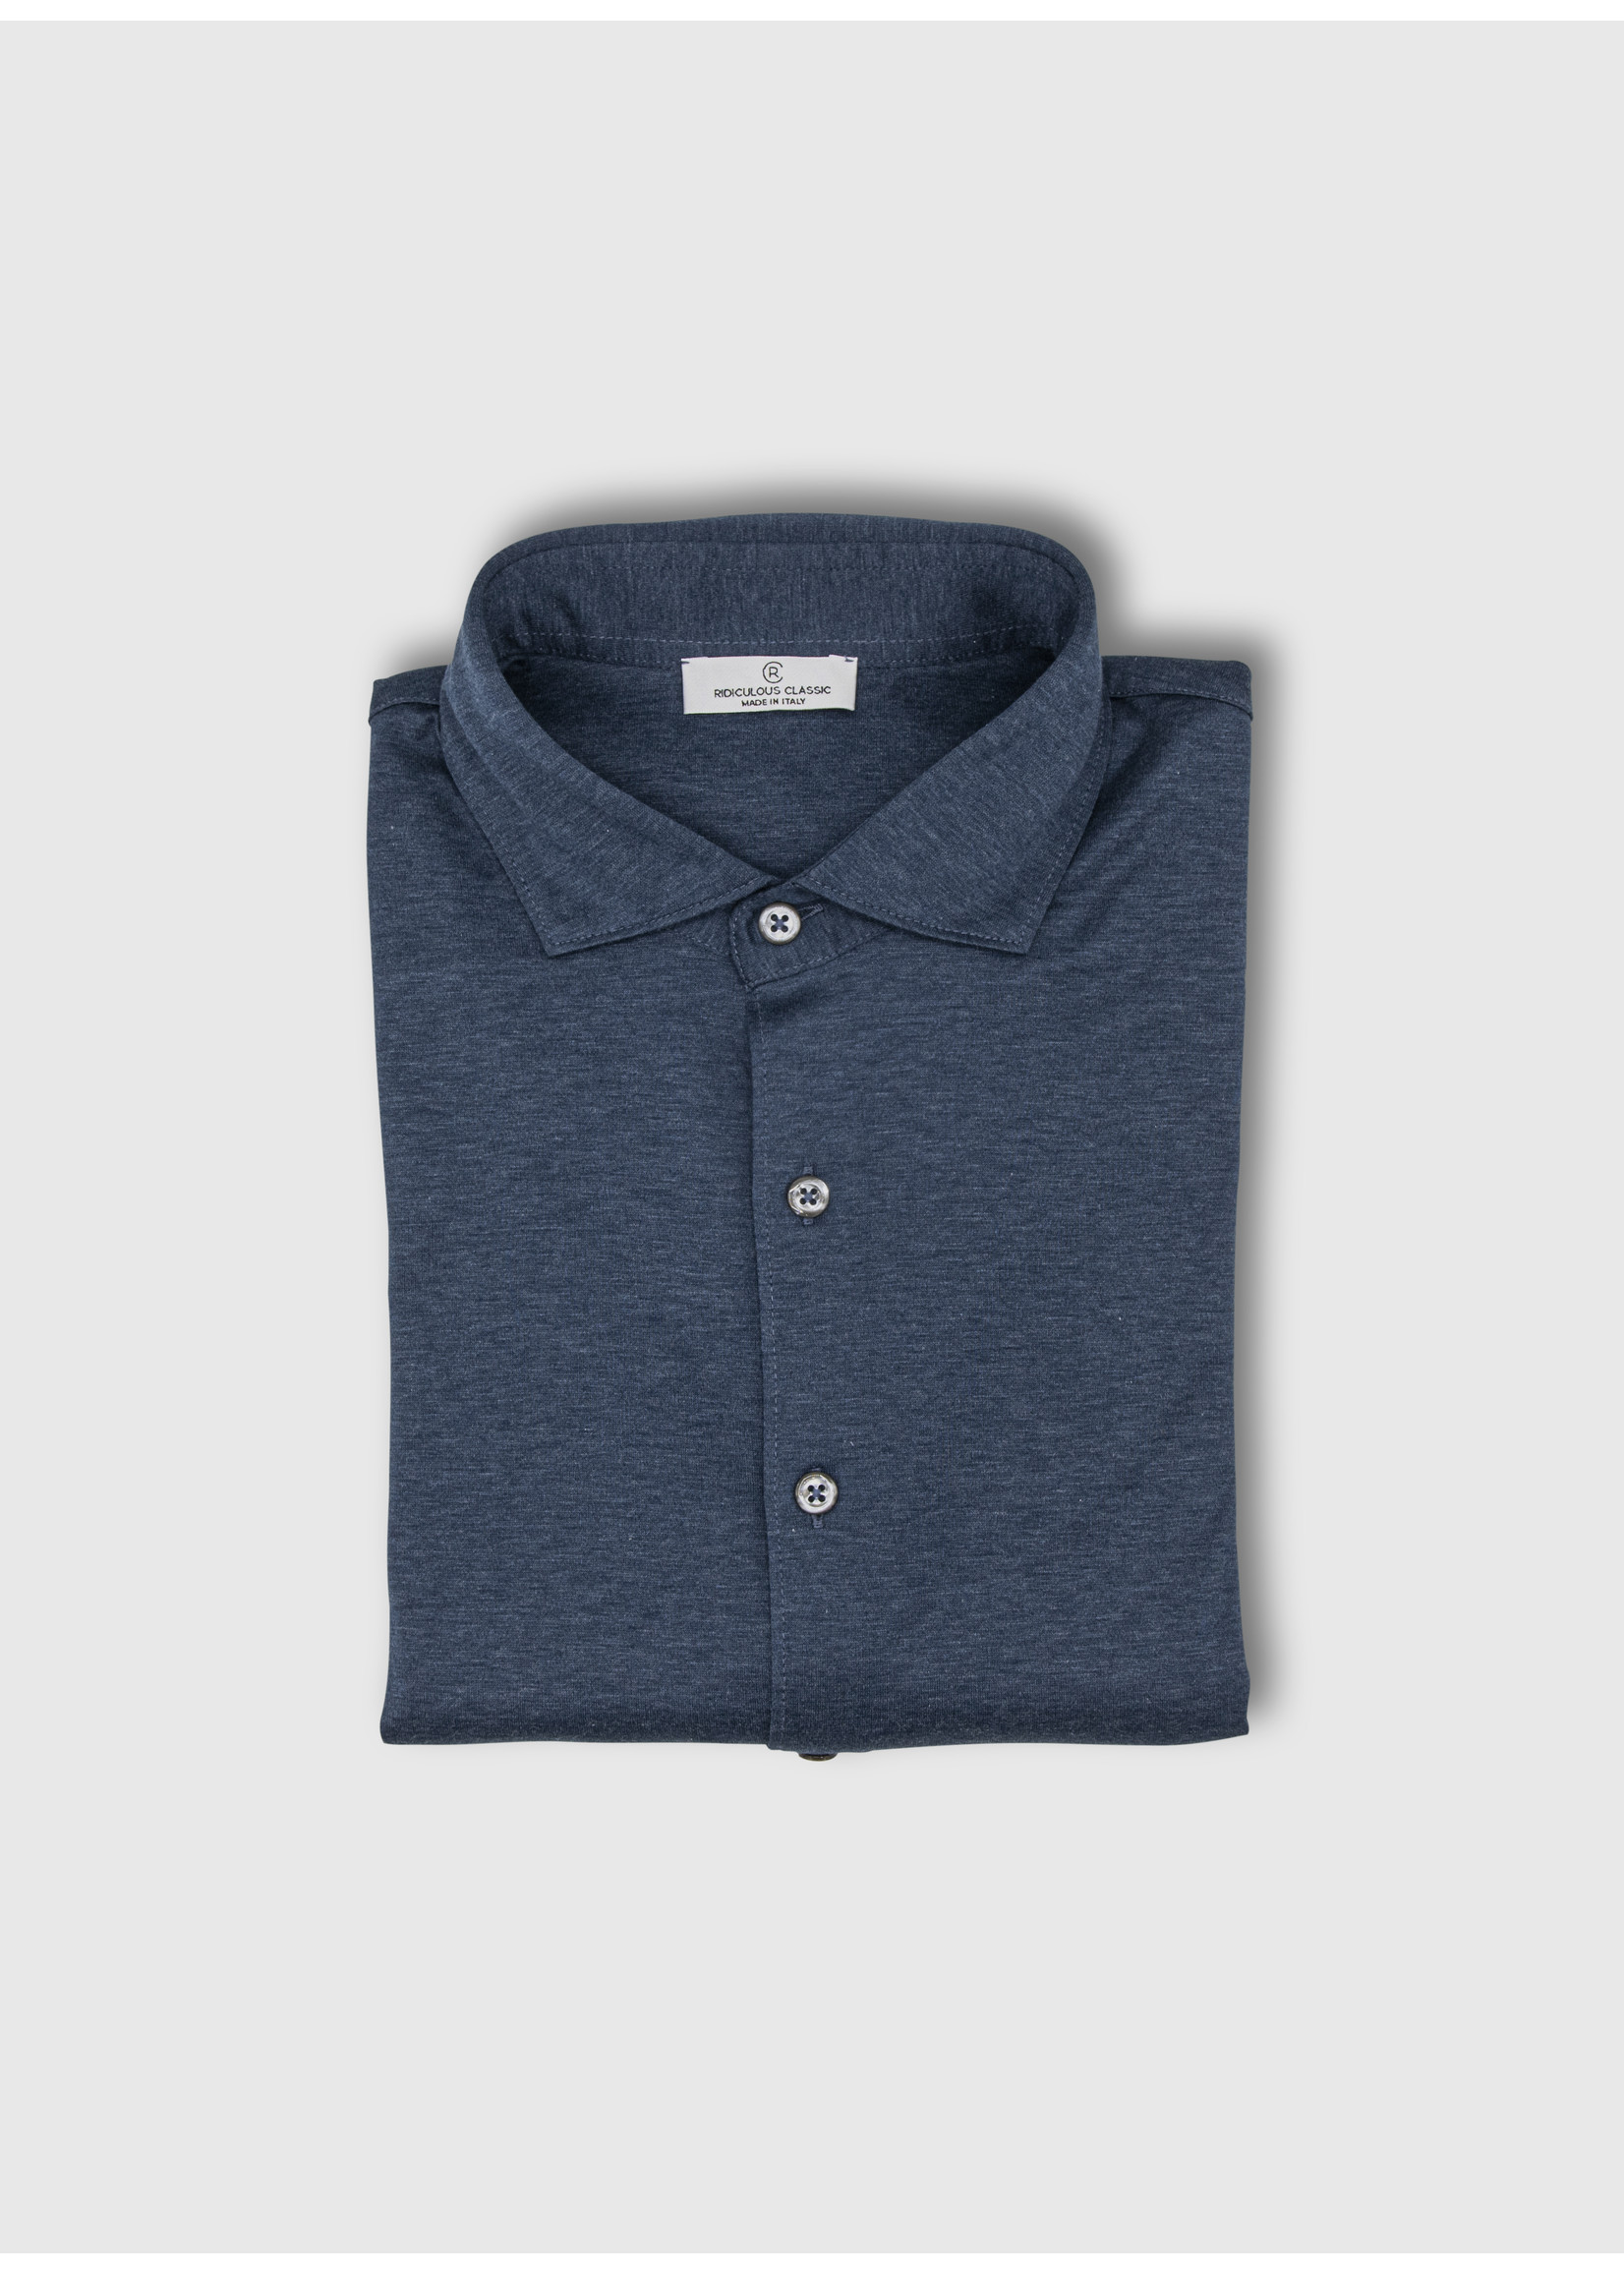 Ridiculous Classic Shirt jeans blue